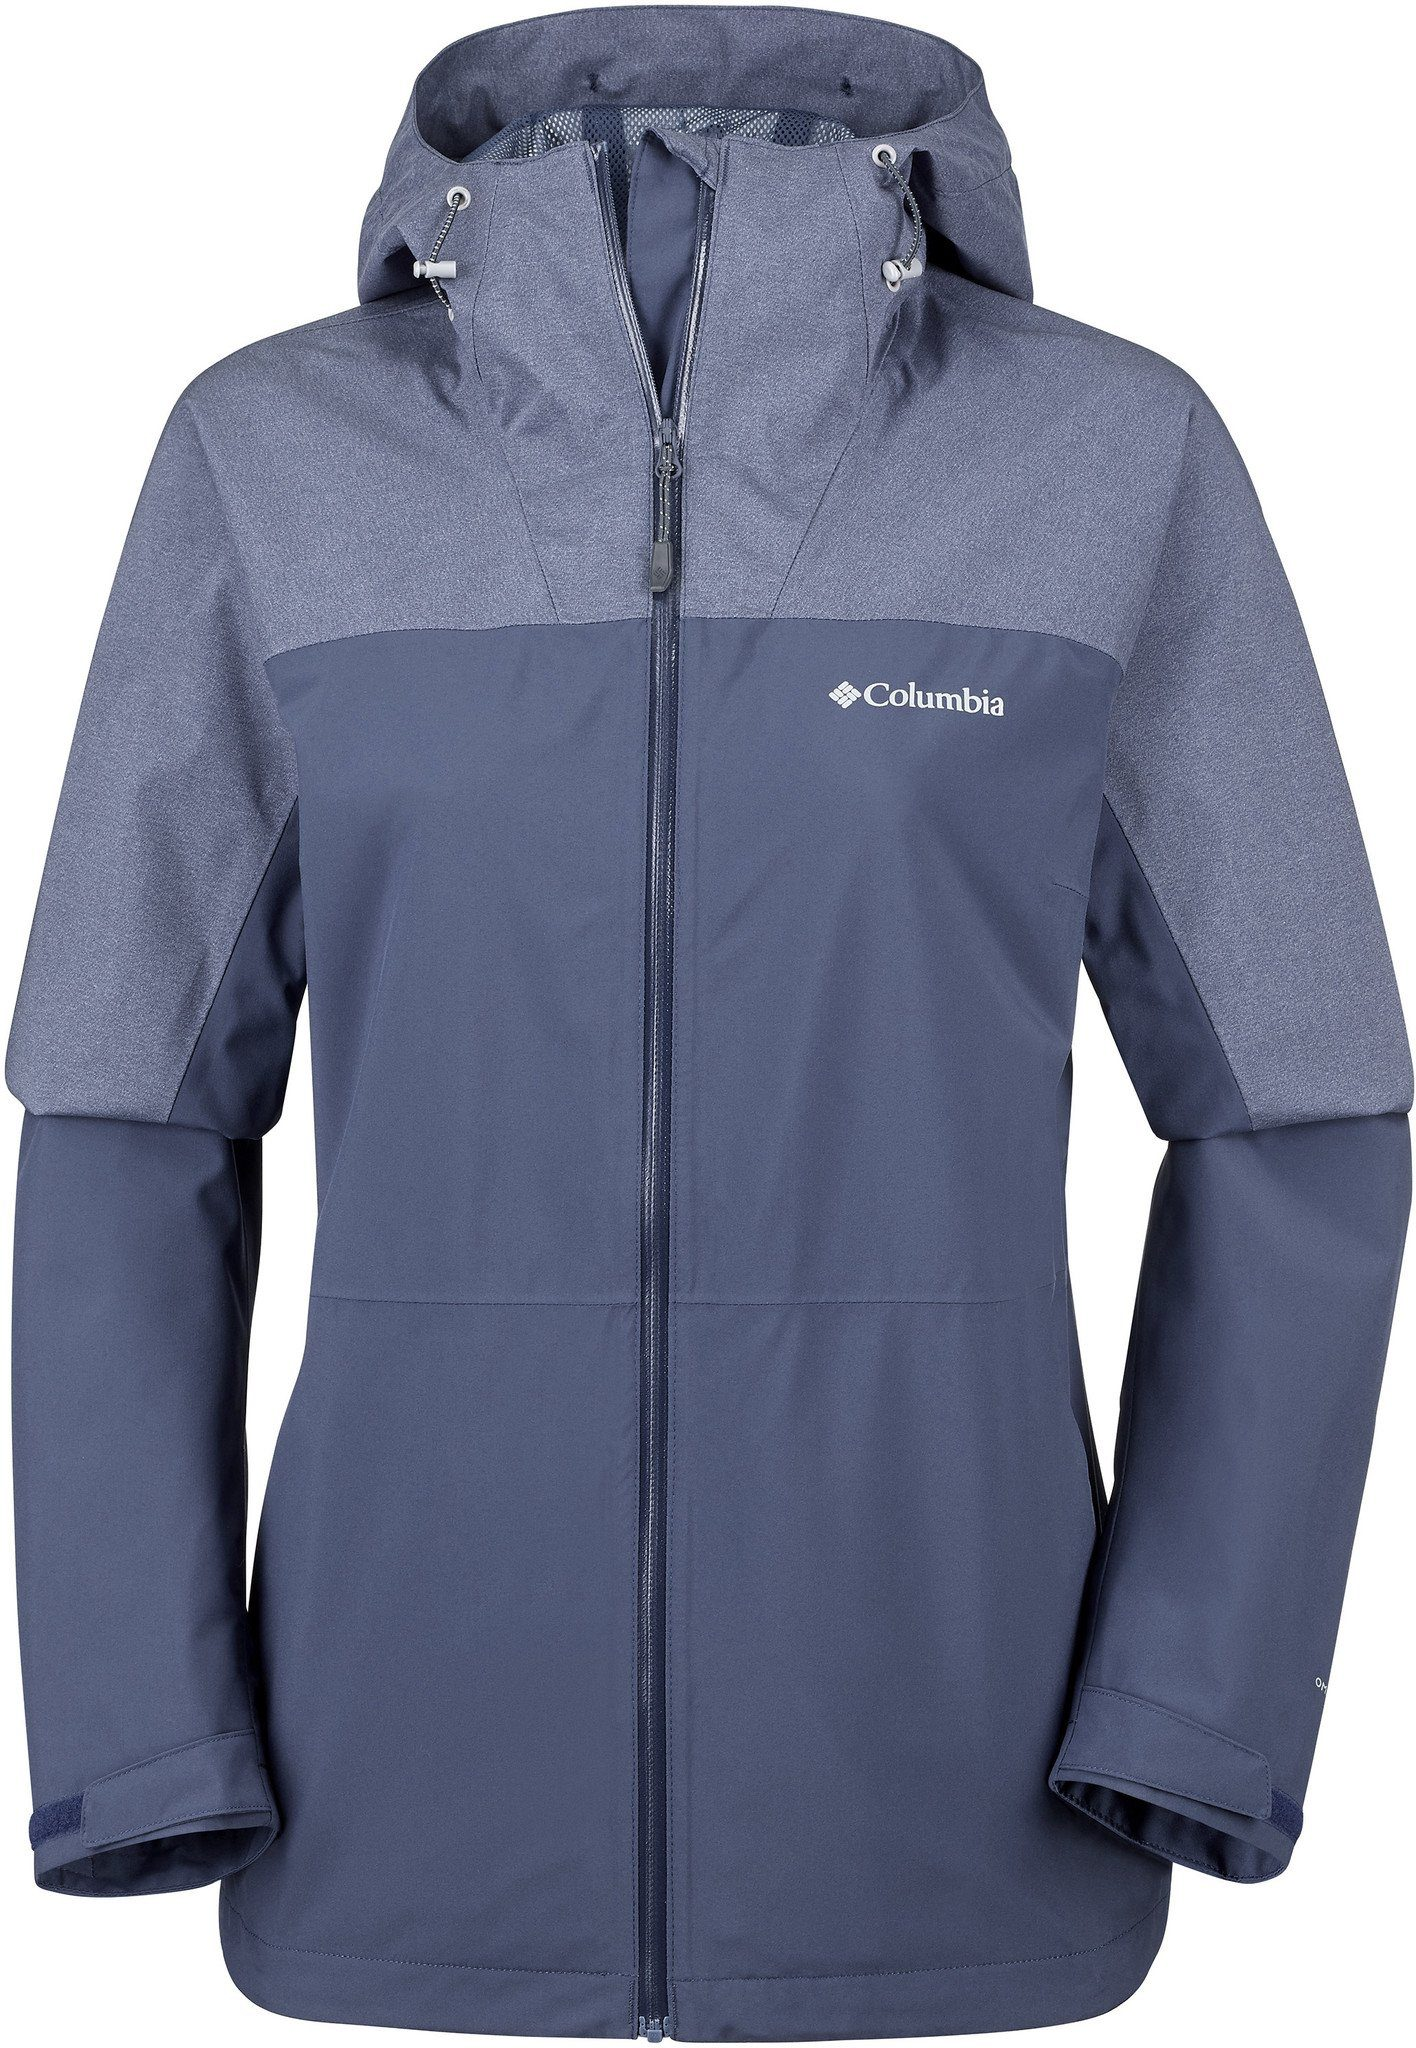 Columbia Outdoorjacke »Evolution Valley II Jacke Damen« online kaufen   OTTO